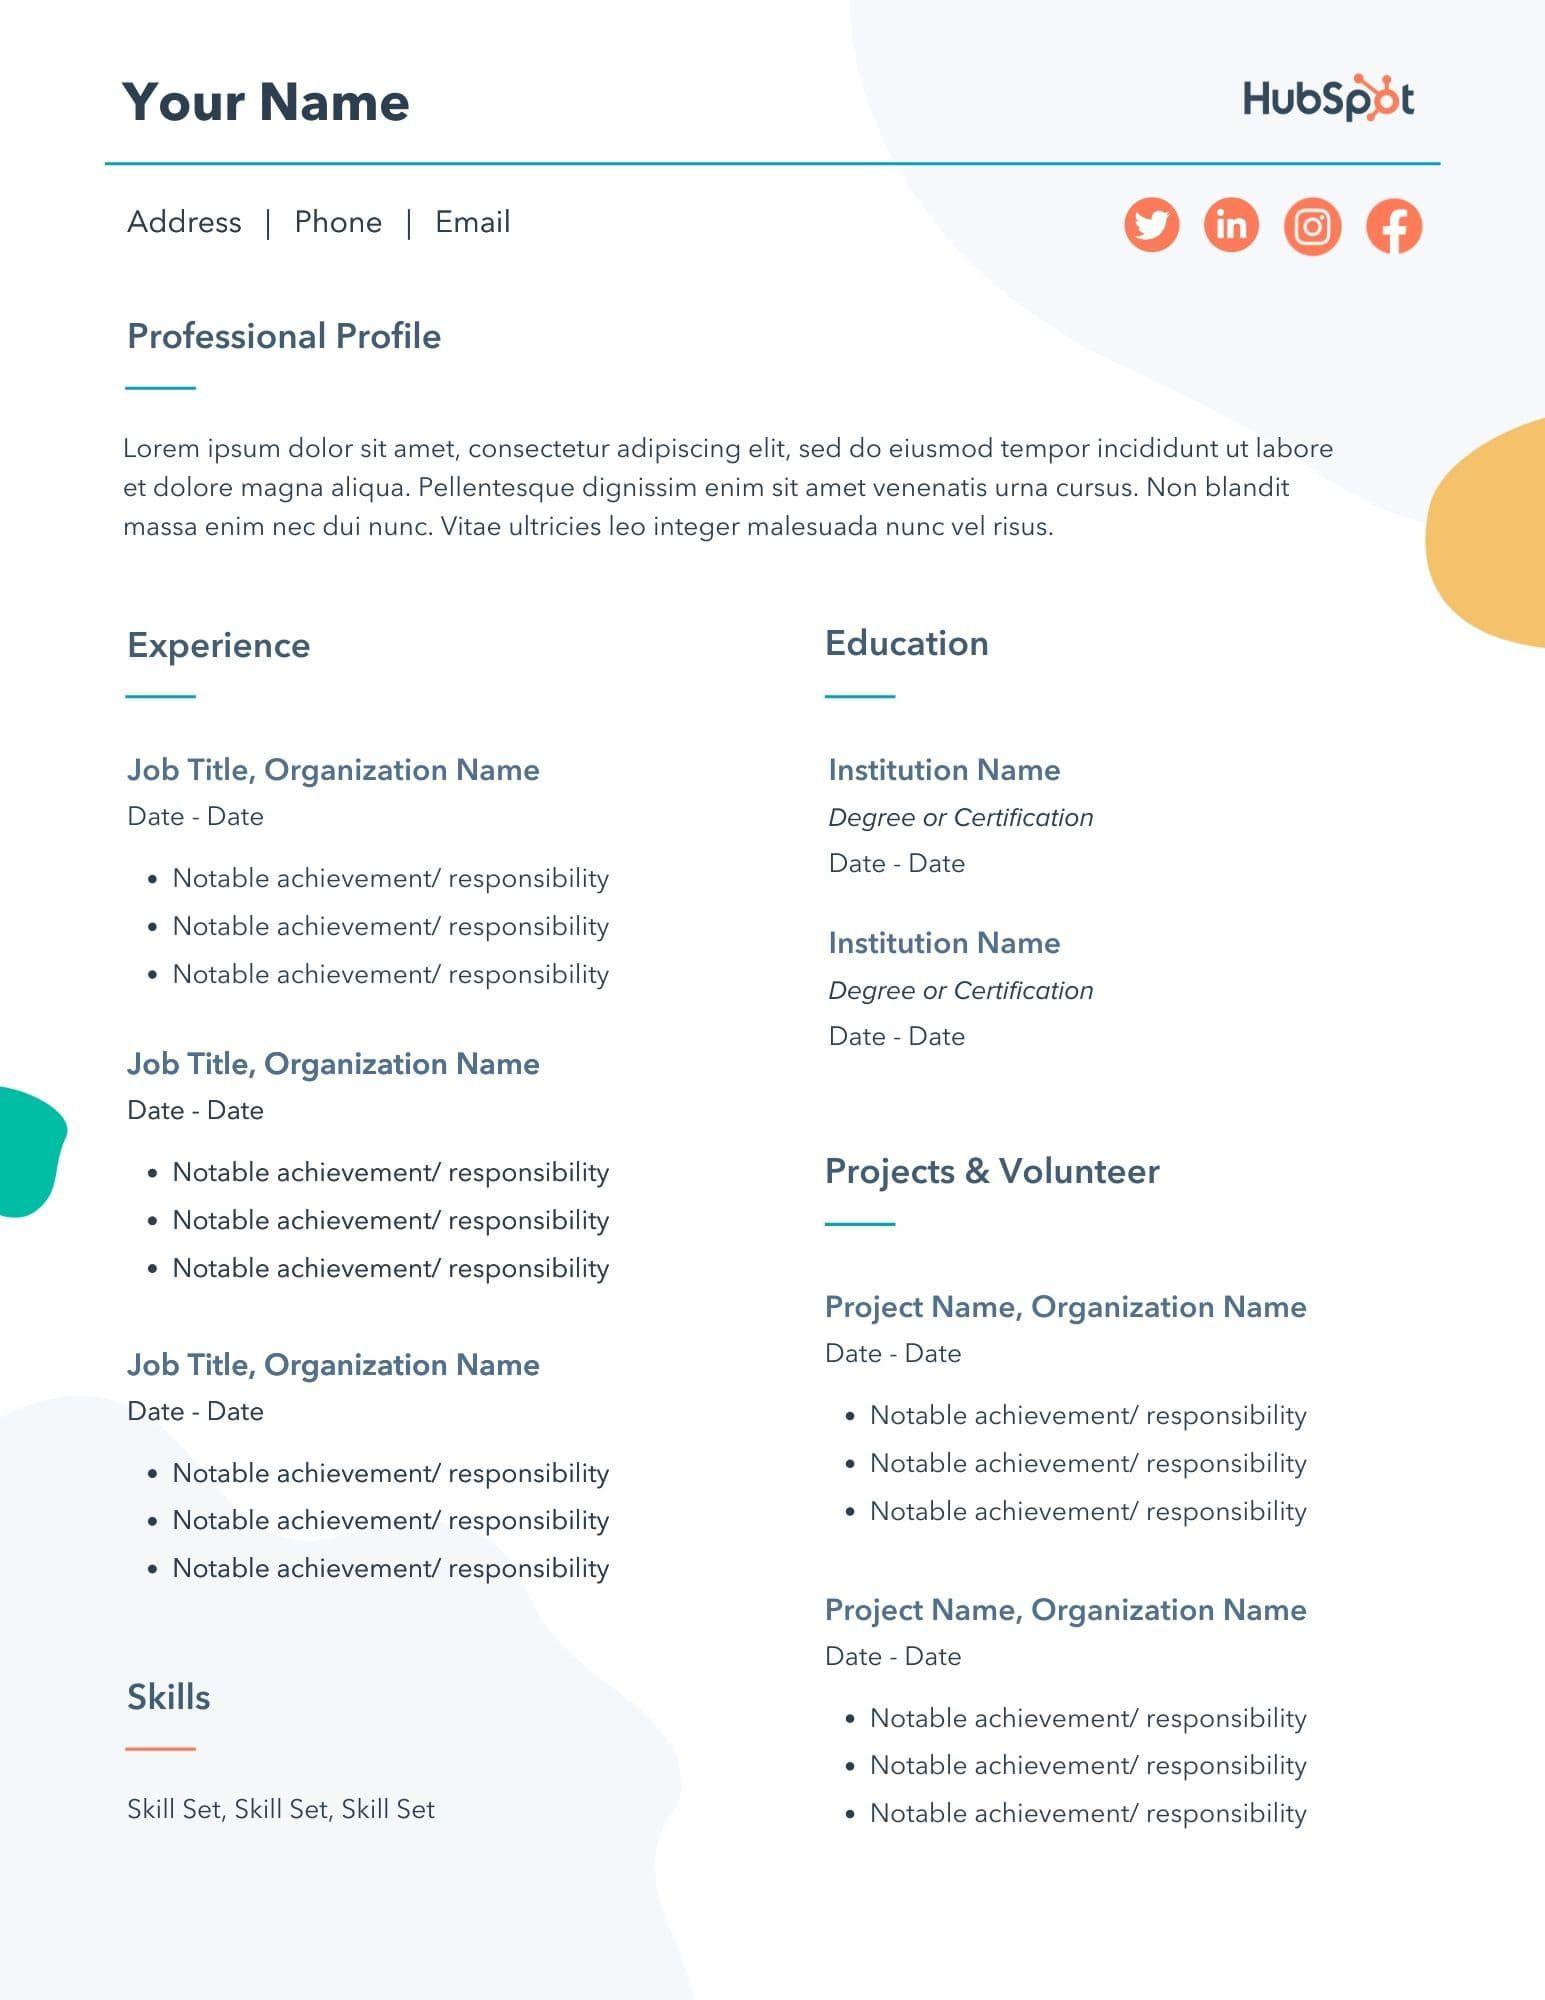 008 Impressive How To Create A Resume Template In Microsoft Word Idea  Cv/resume DocxFull